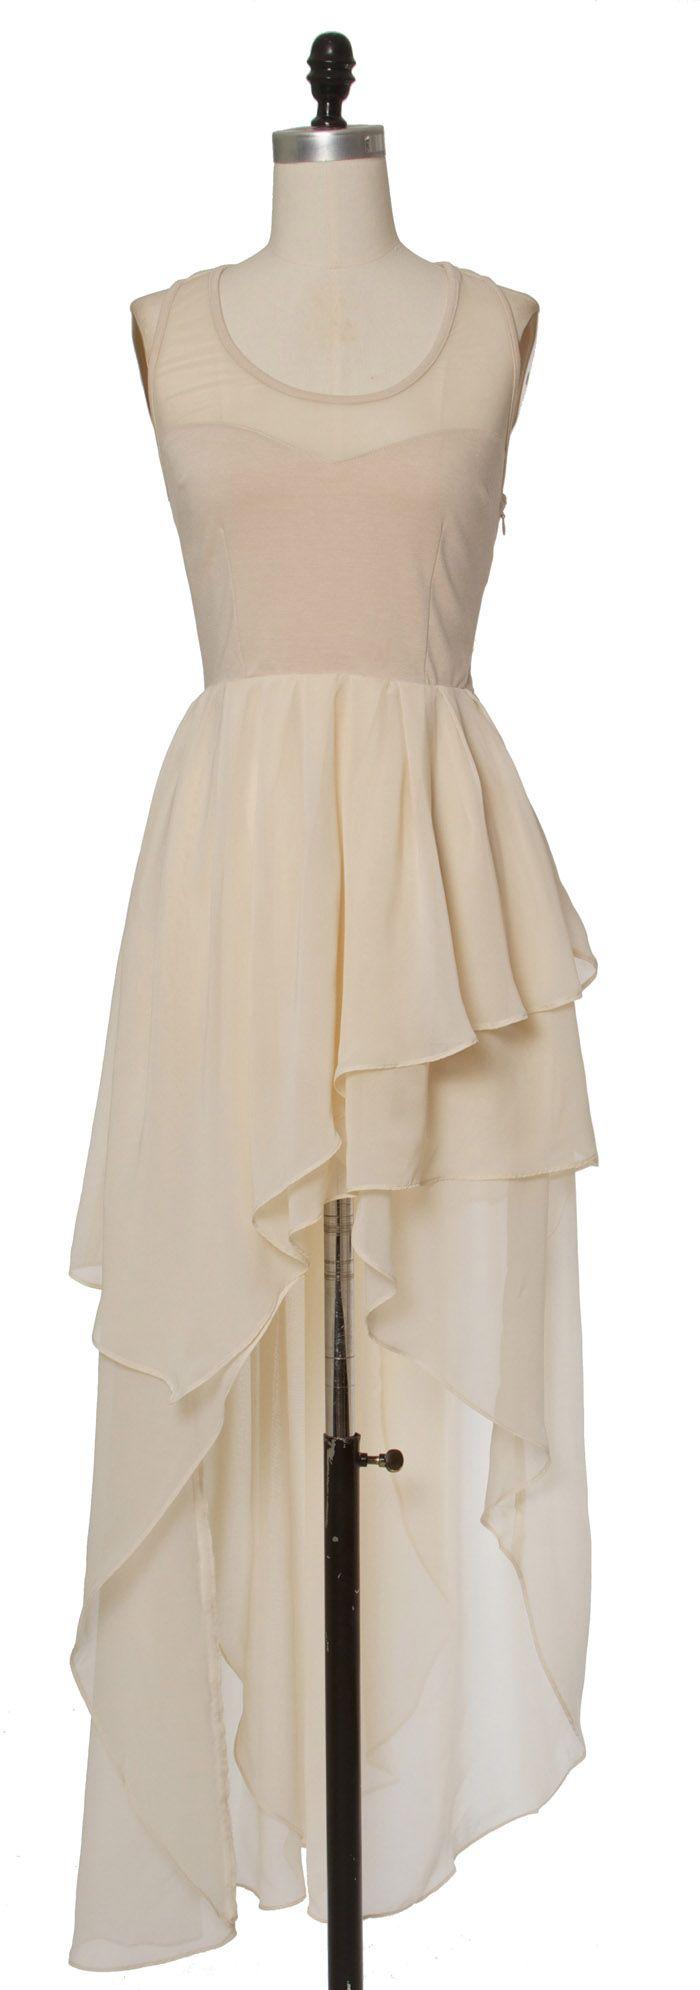 Trendy & Cute Clothing - Ark & Co - Waves Of Nude Dress - chloelovescharlie.com | $87.00